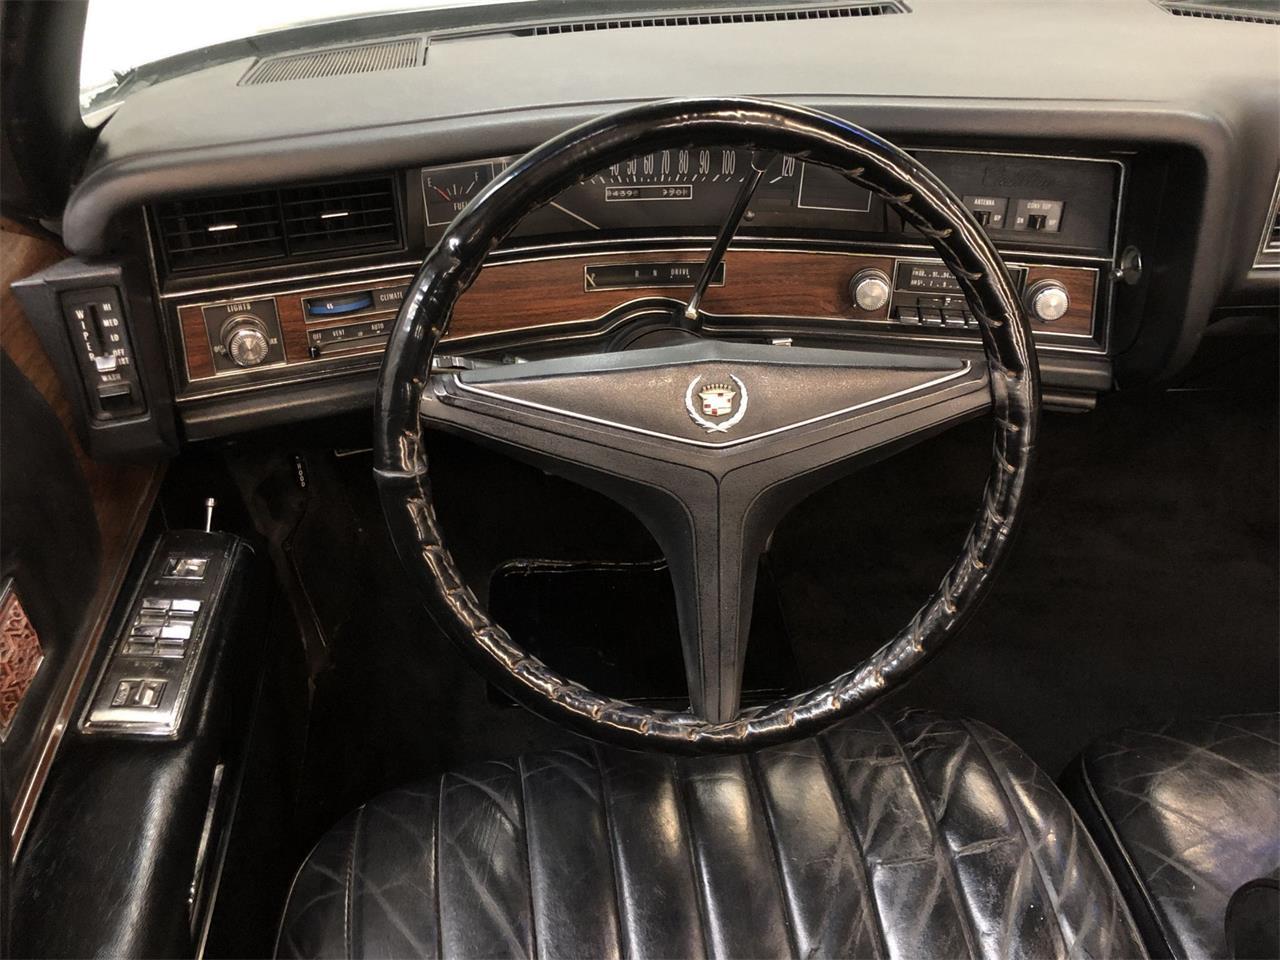 1973 Cadillac Eldorado for sale in Maple Lake, MN ...